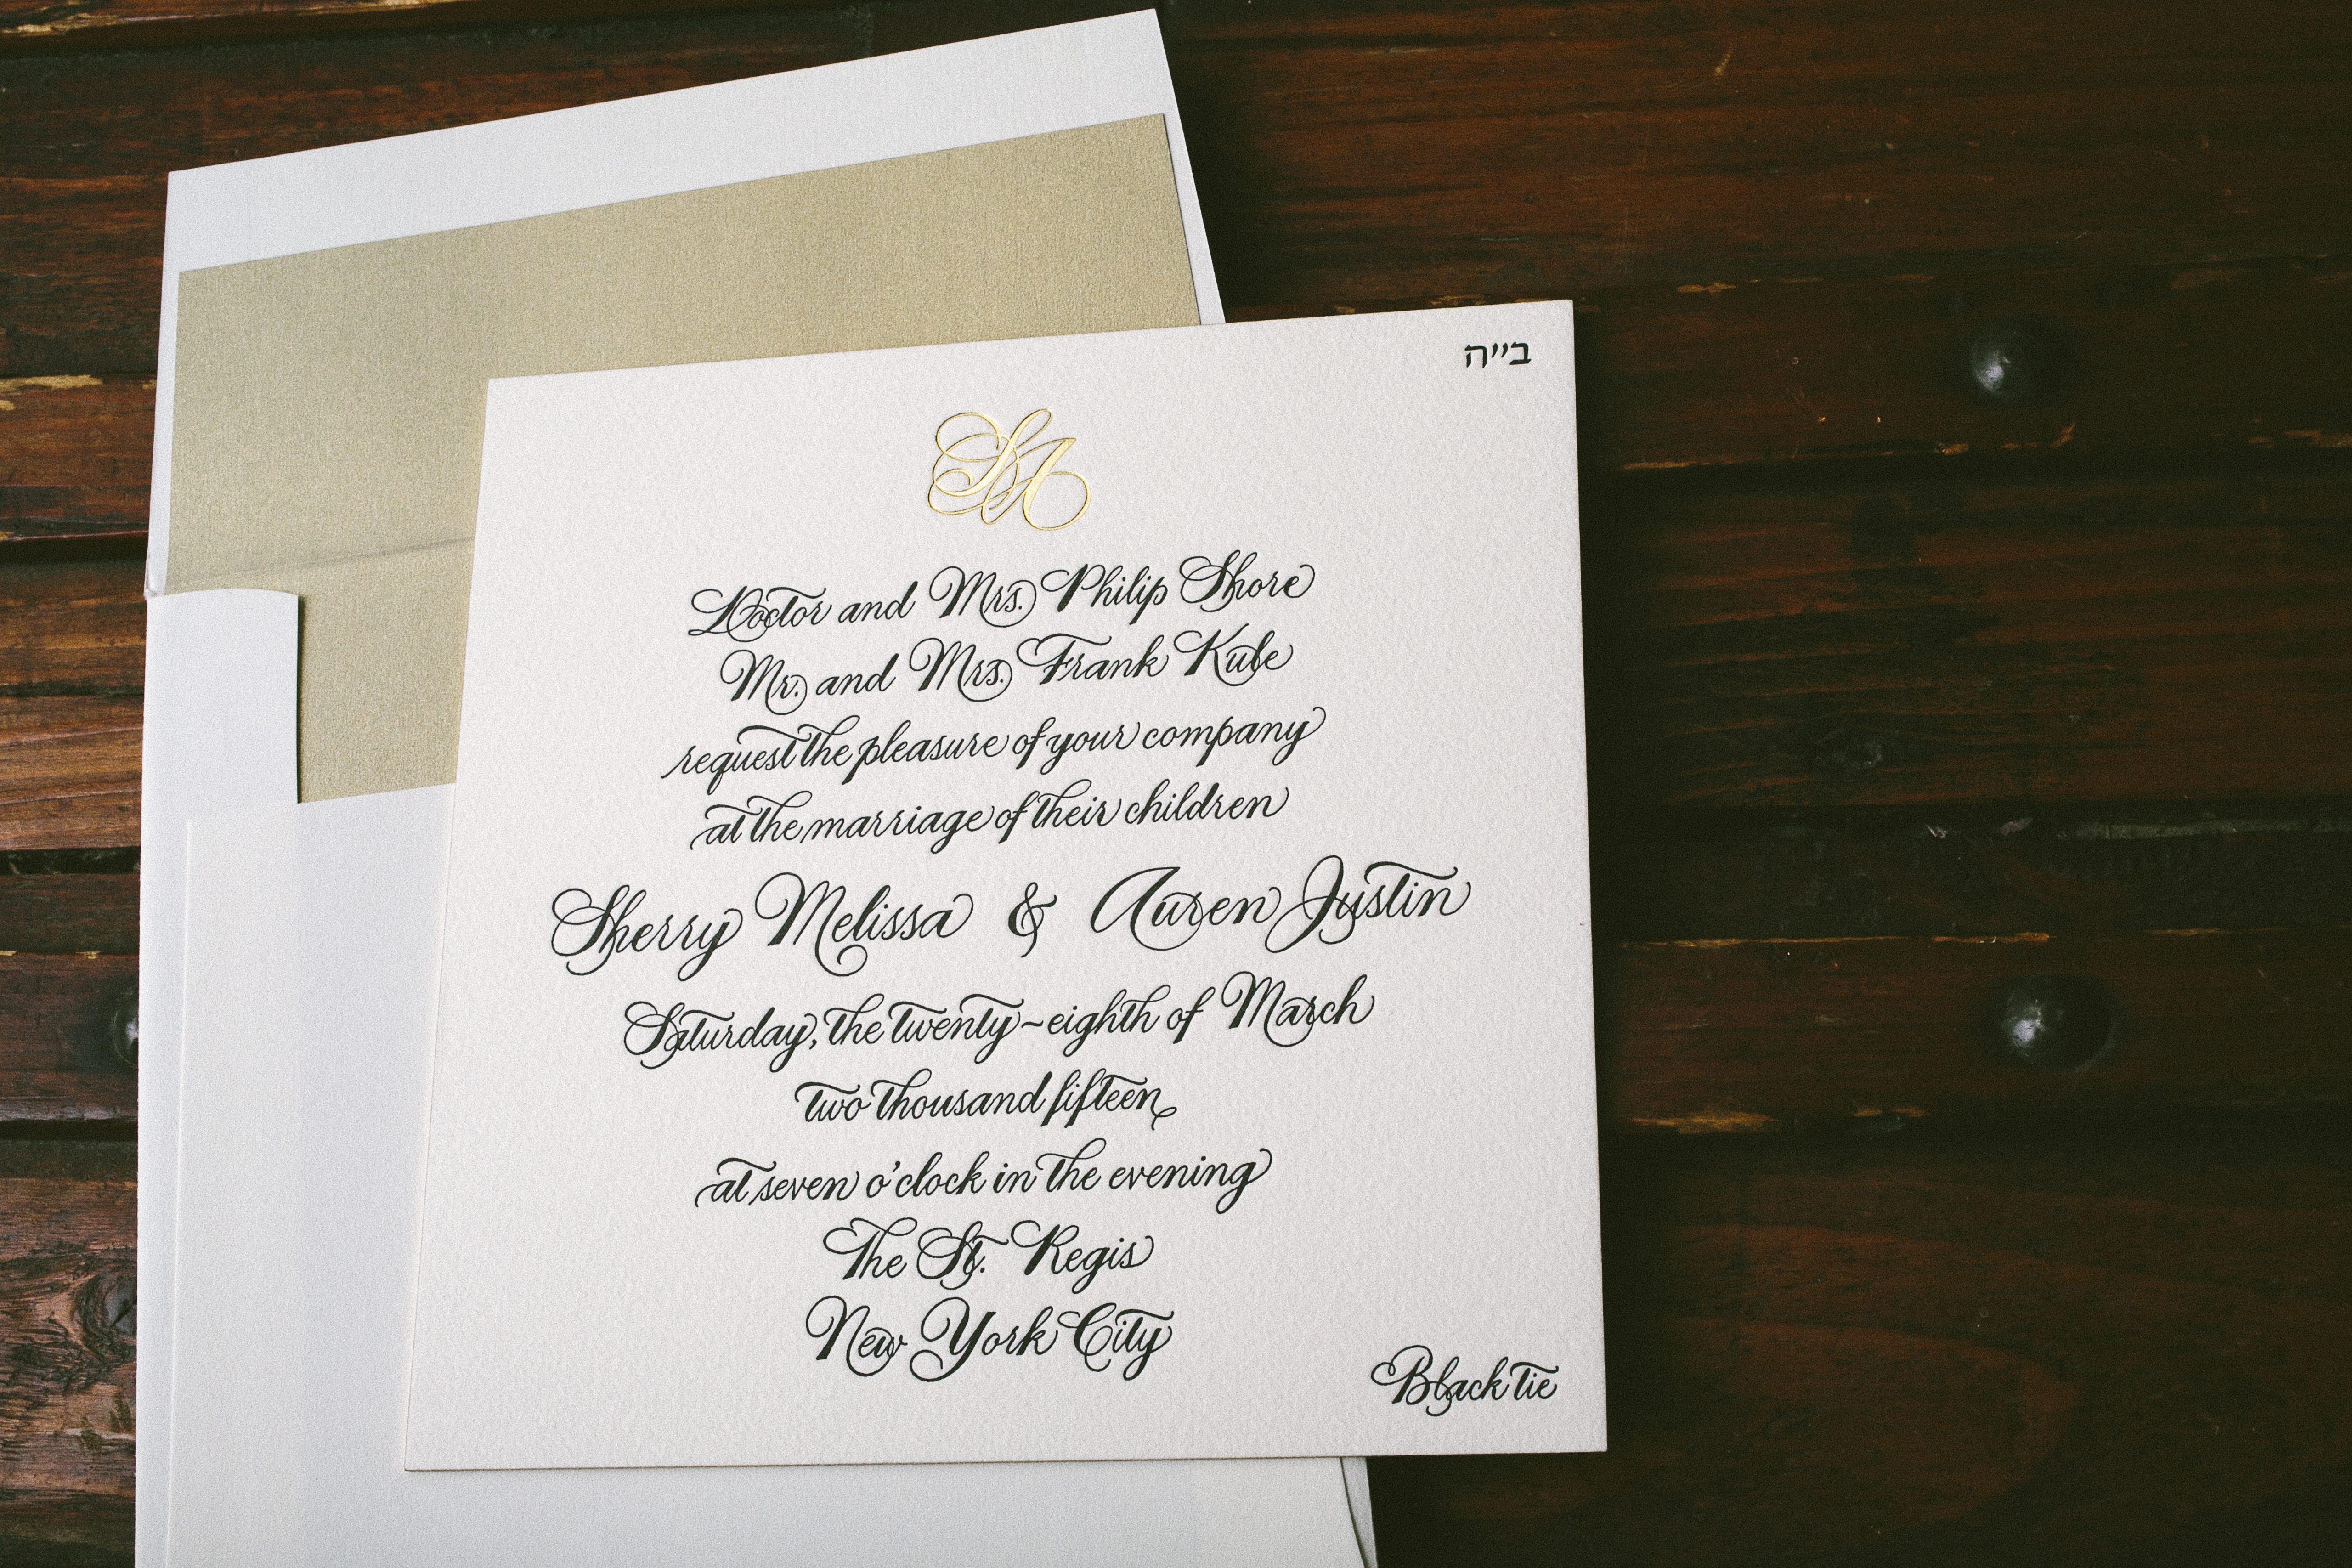 Black White Gold Wedding Invitations: Hand Calligraphed Black And Gold Wedding Invitations